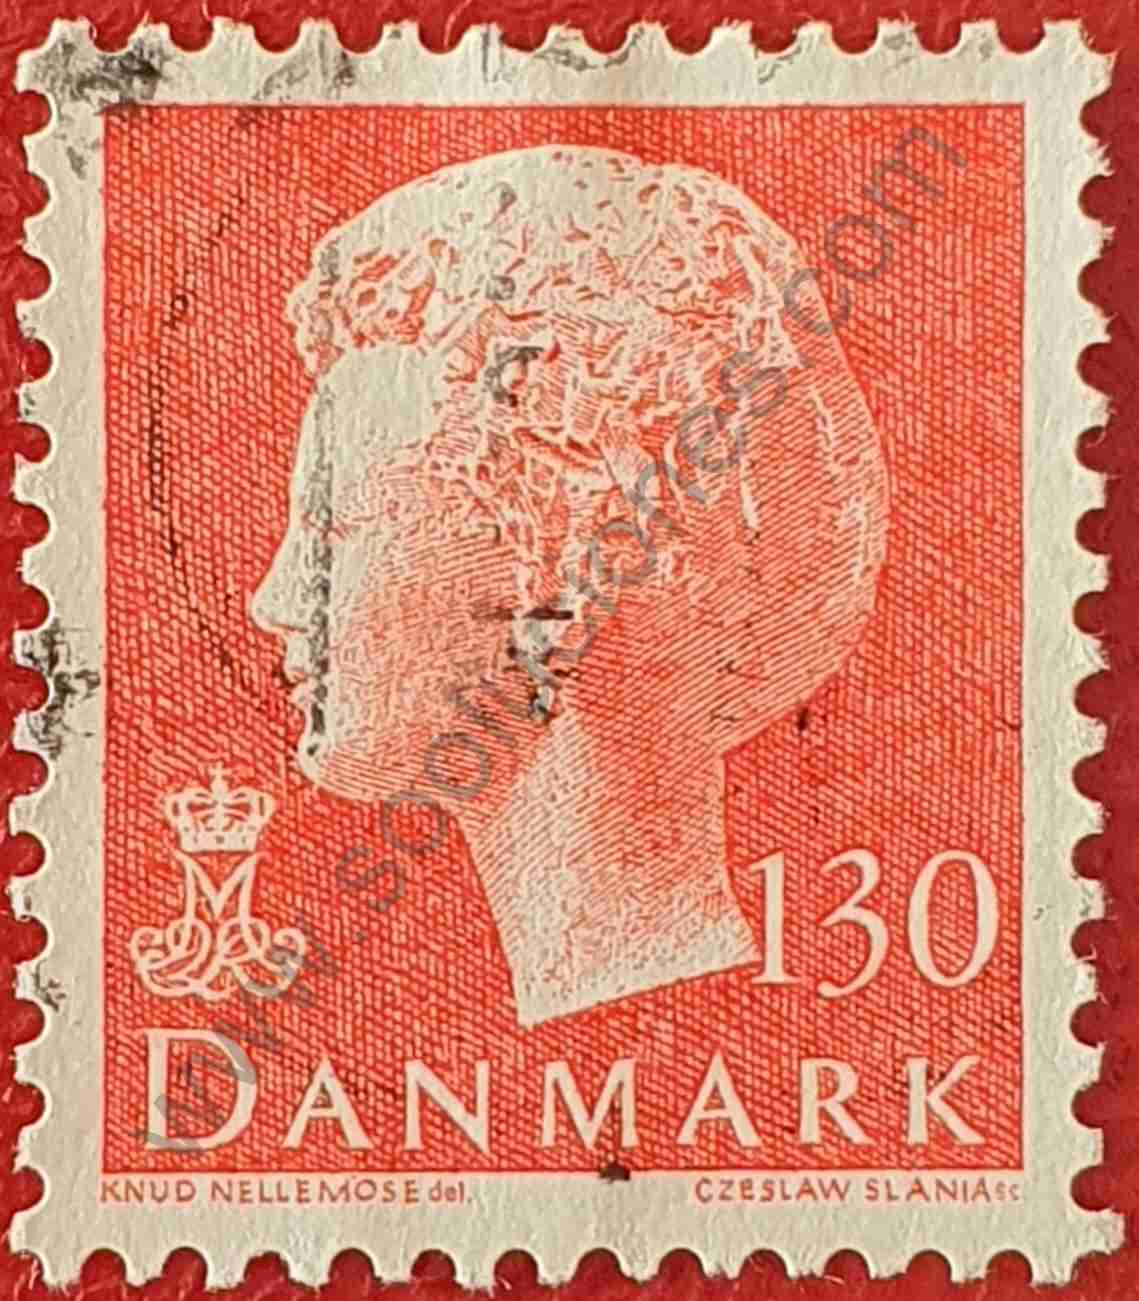 Reina Margarita II - Sello Dinamarca 1979